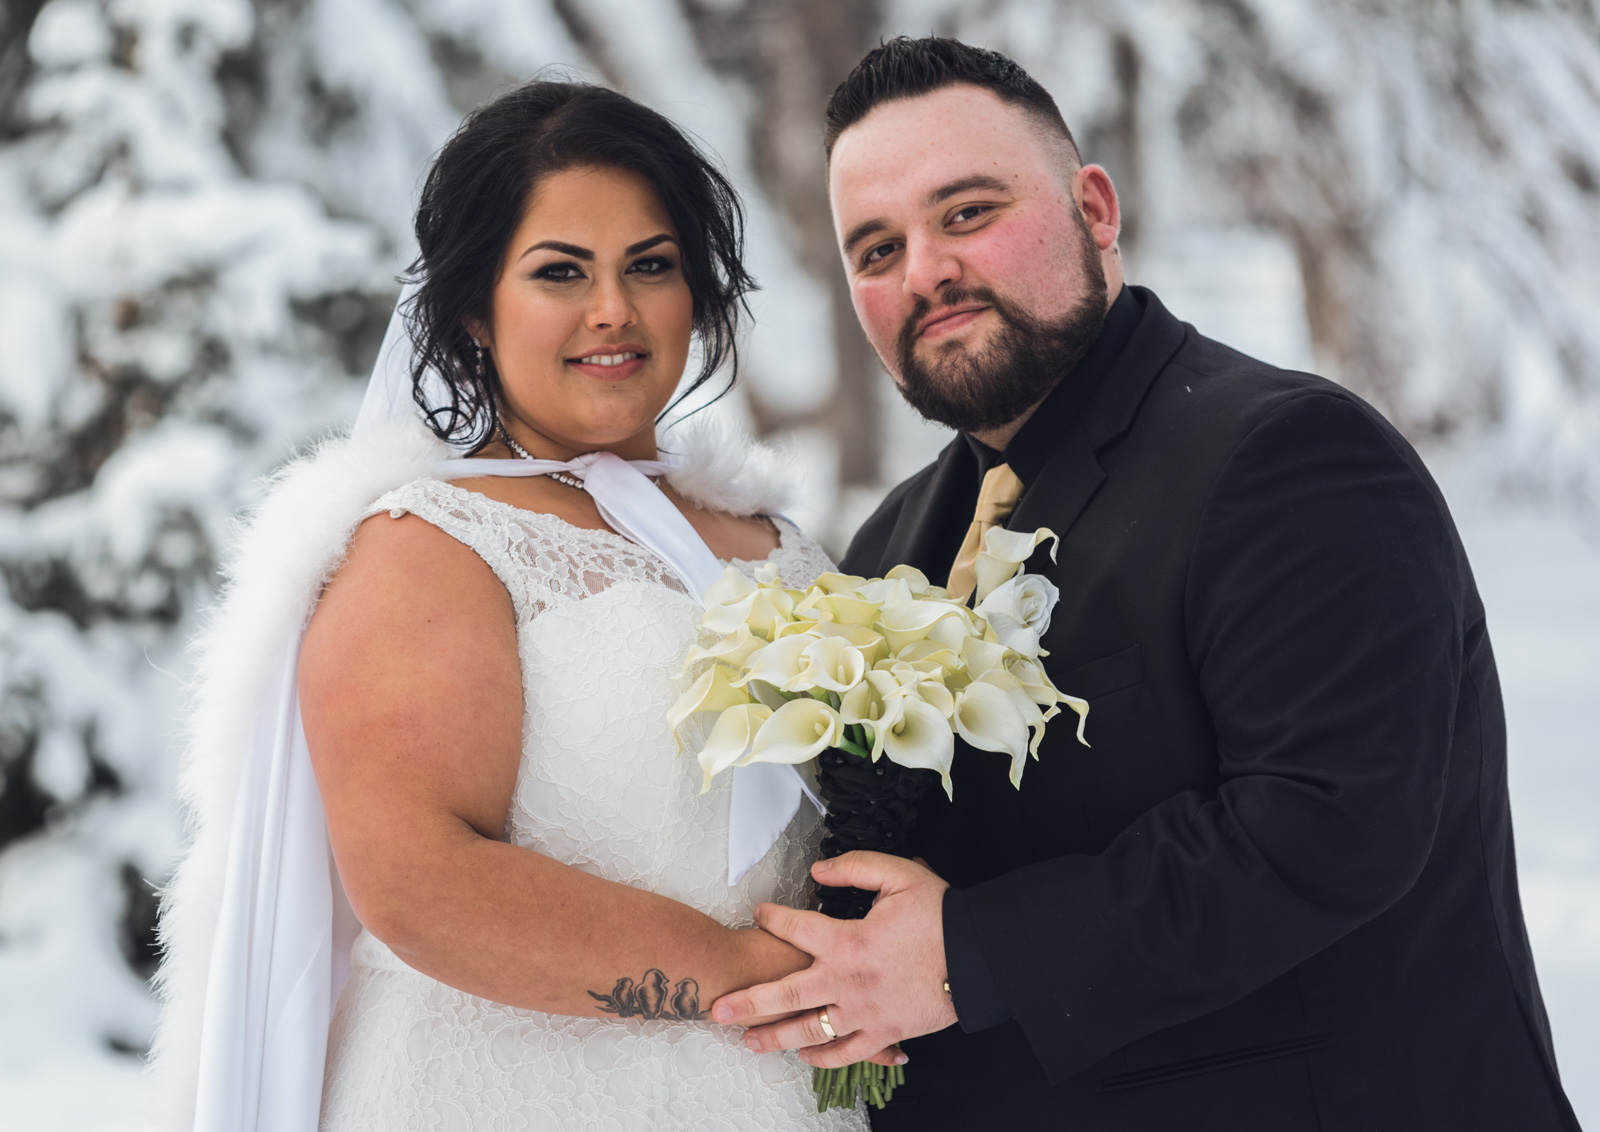 rheana-chris-wedding-blog-159.jpg